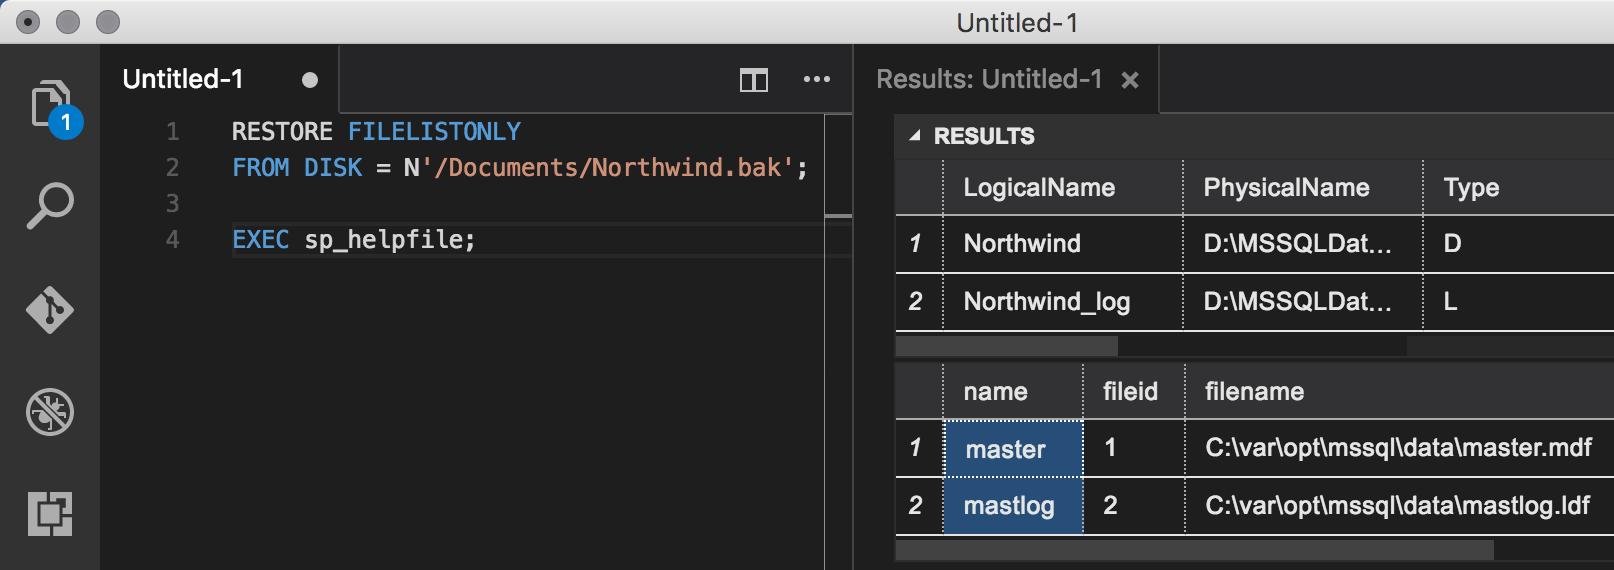 Checking access to BAK file and destination data/log folder